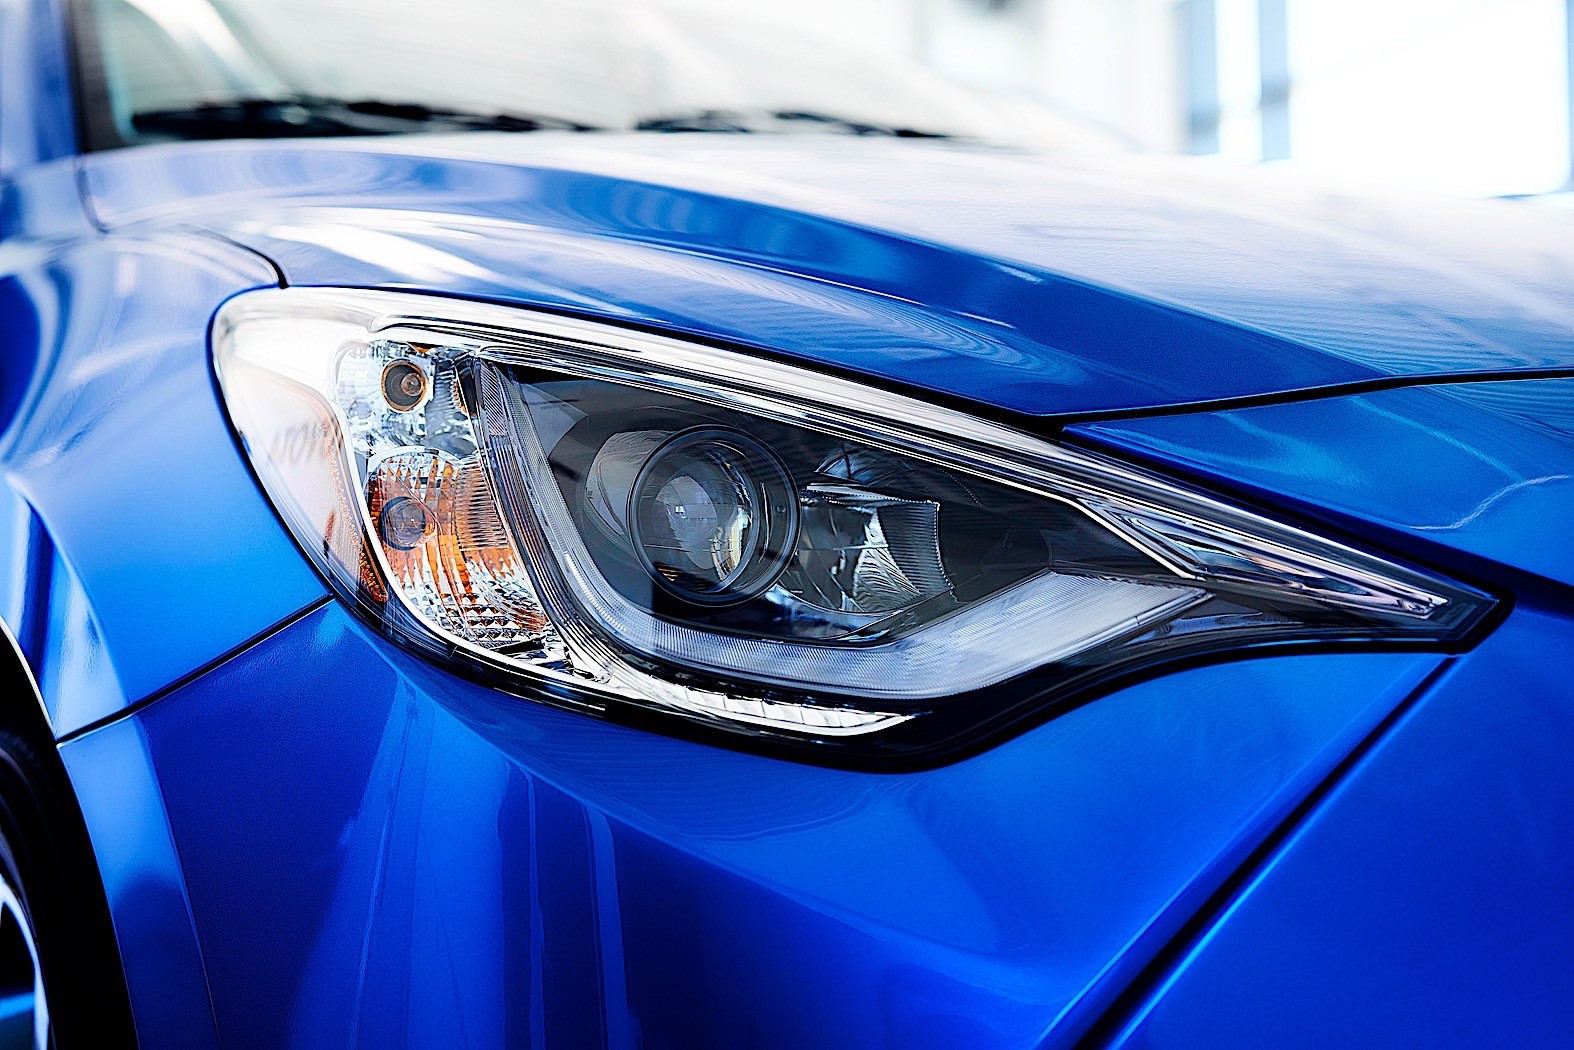 2020 toyota yaris hatchback revealed before nyias debut